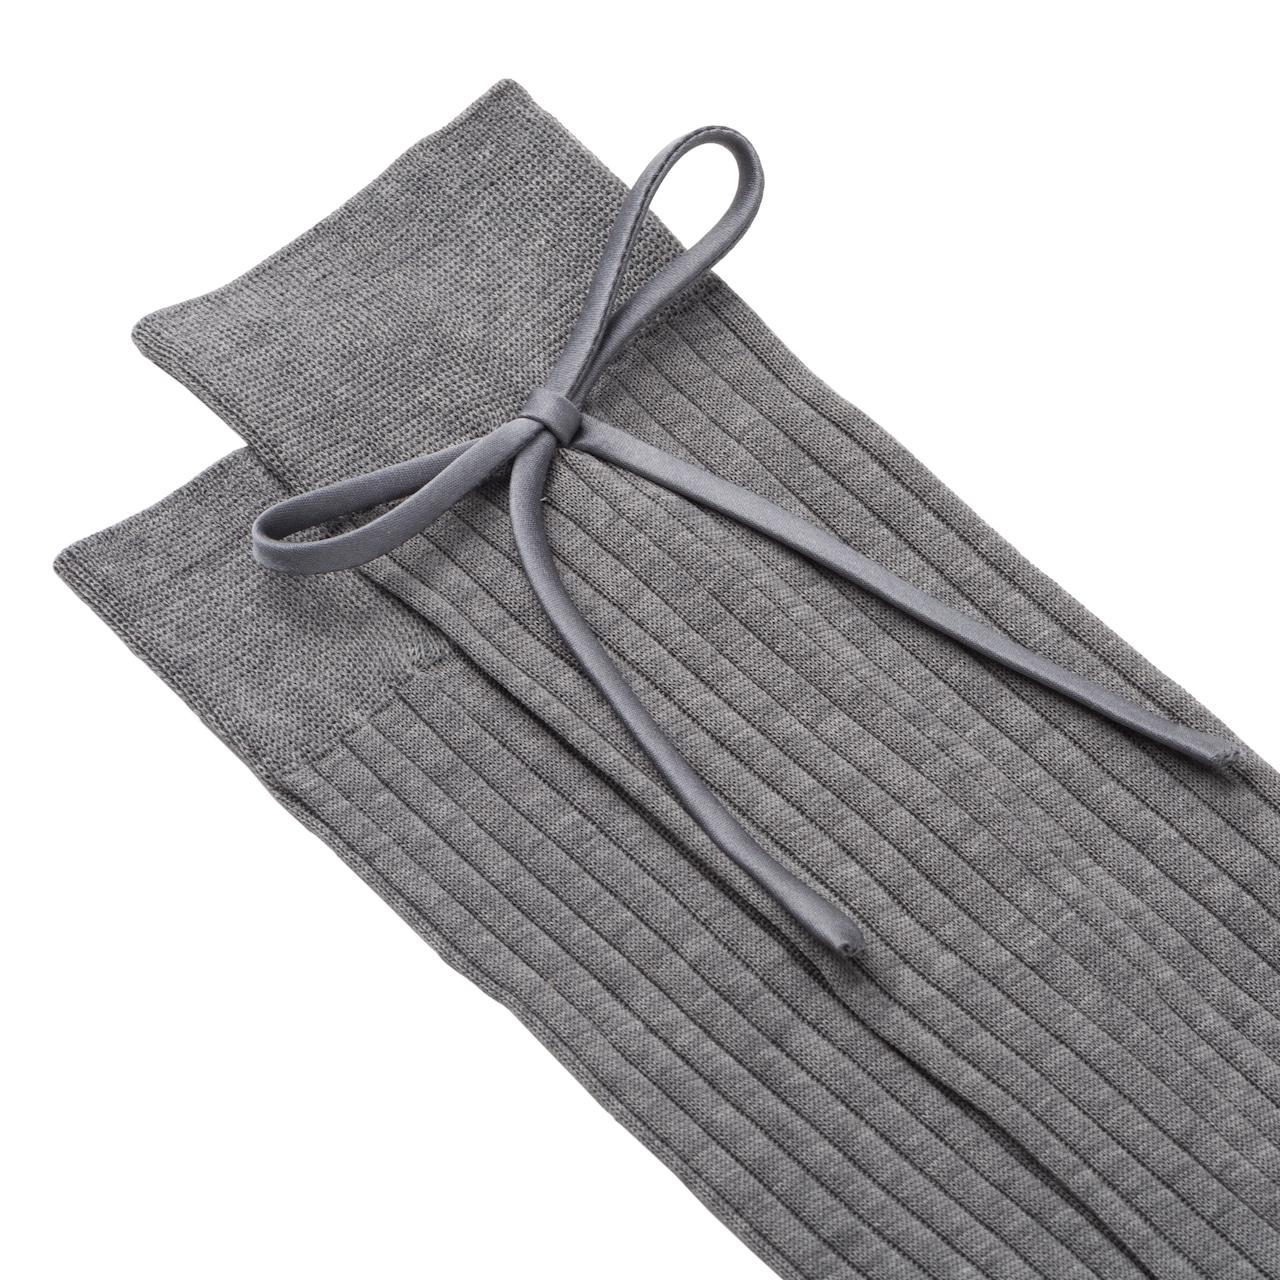 Lisle cotton socks with bow